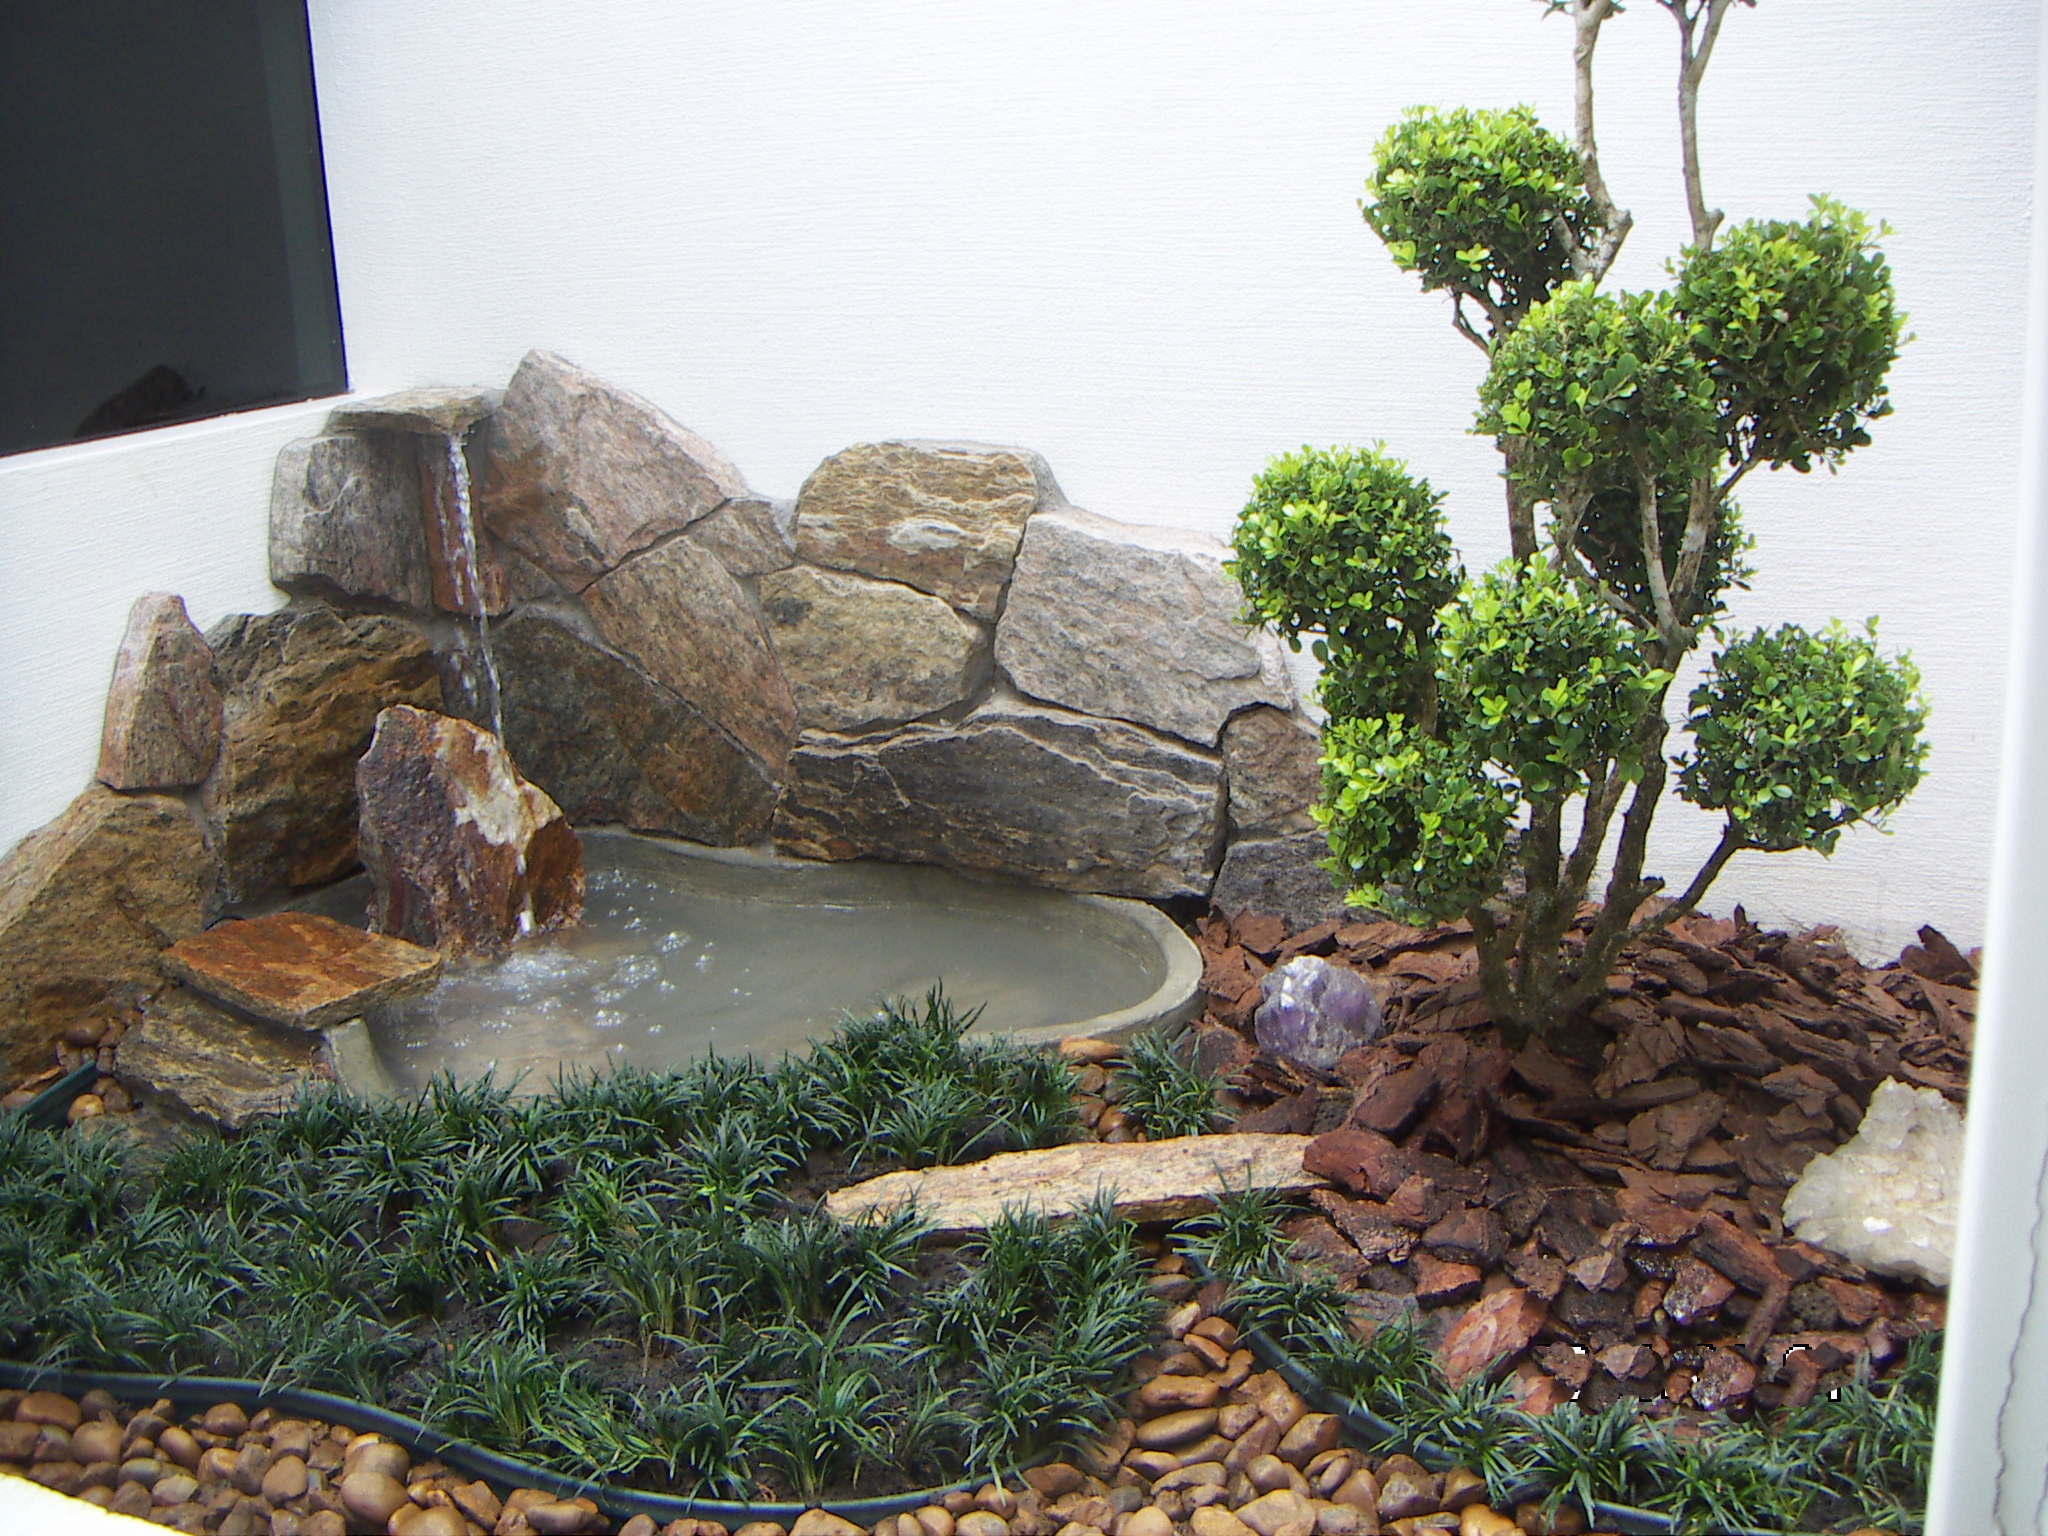 Paisagismo Oriental História Dicas Para Construir um Jardim  Jardim